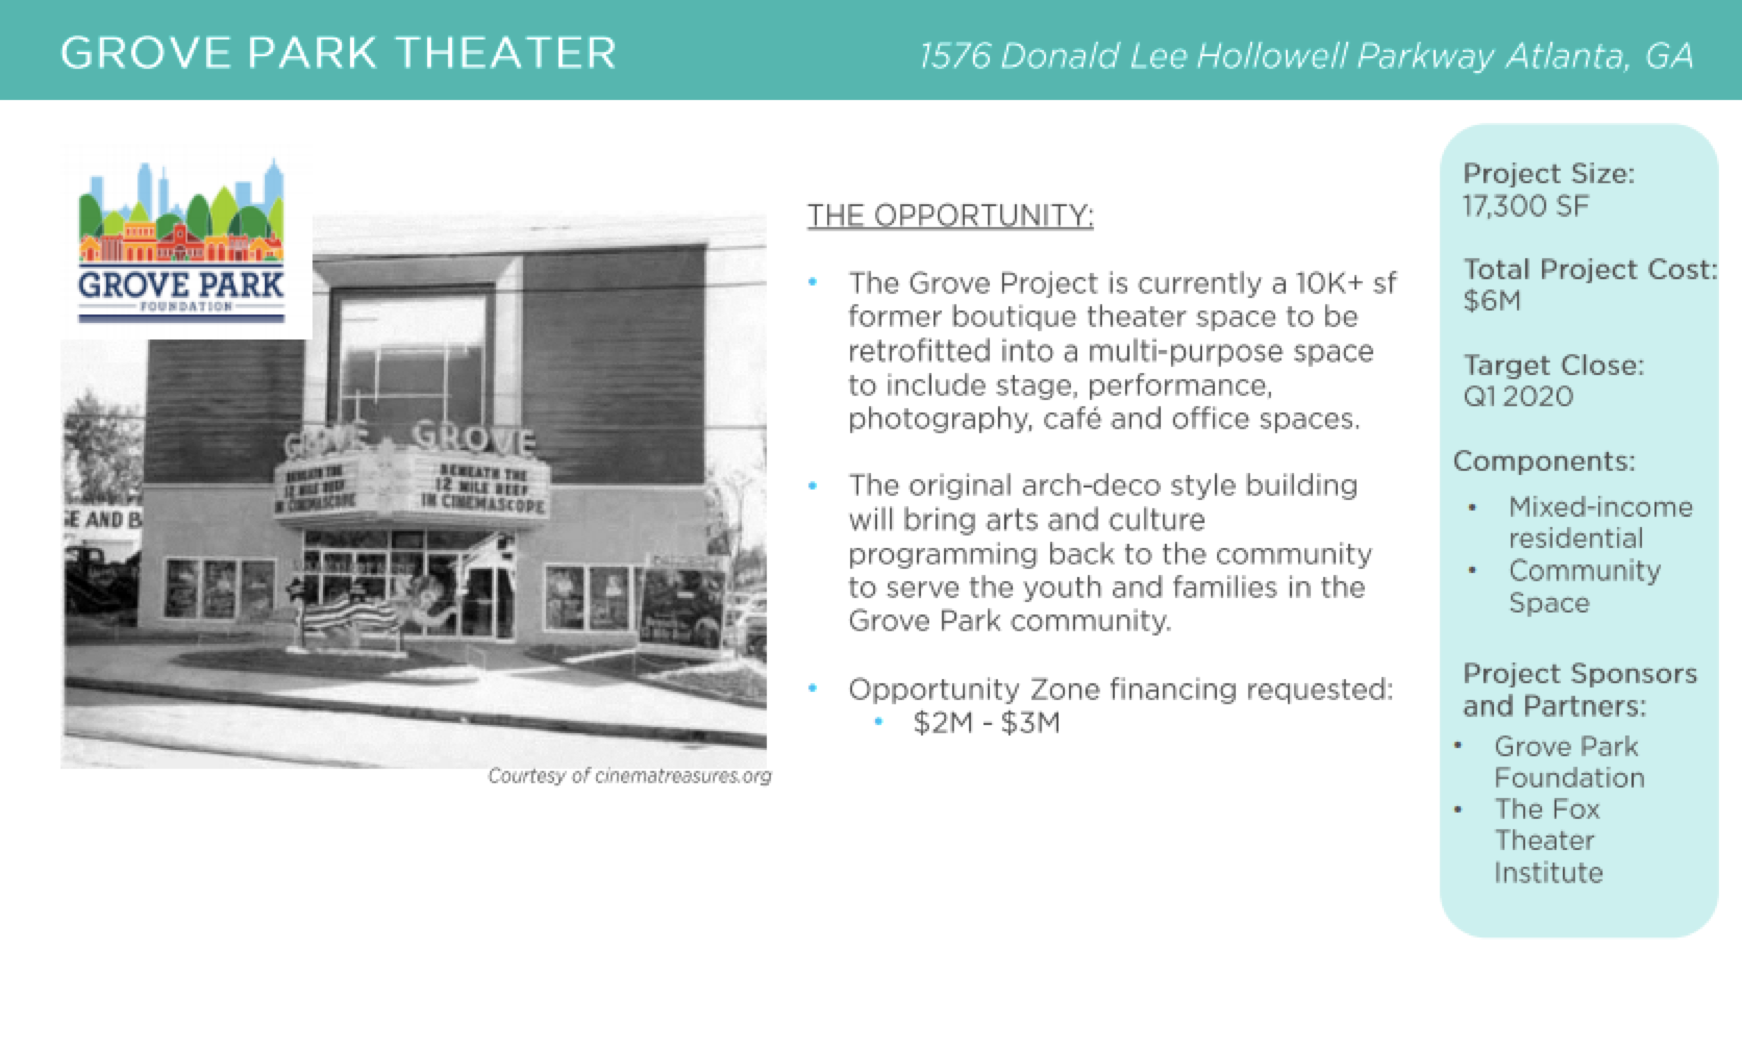 InvestAtlanta_GroveParkTheater.png